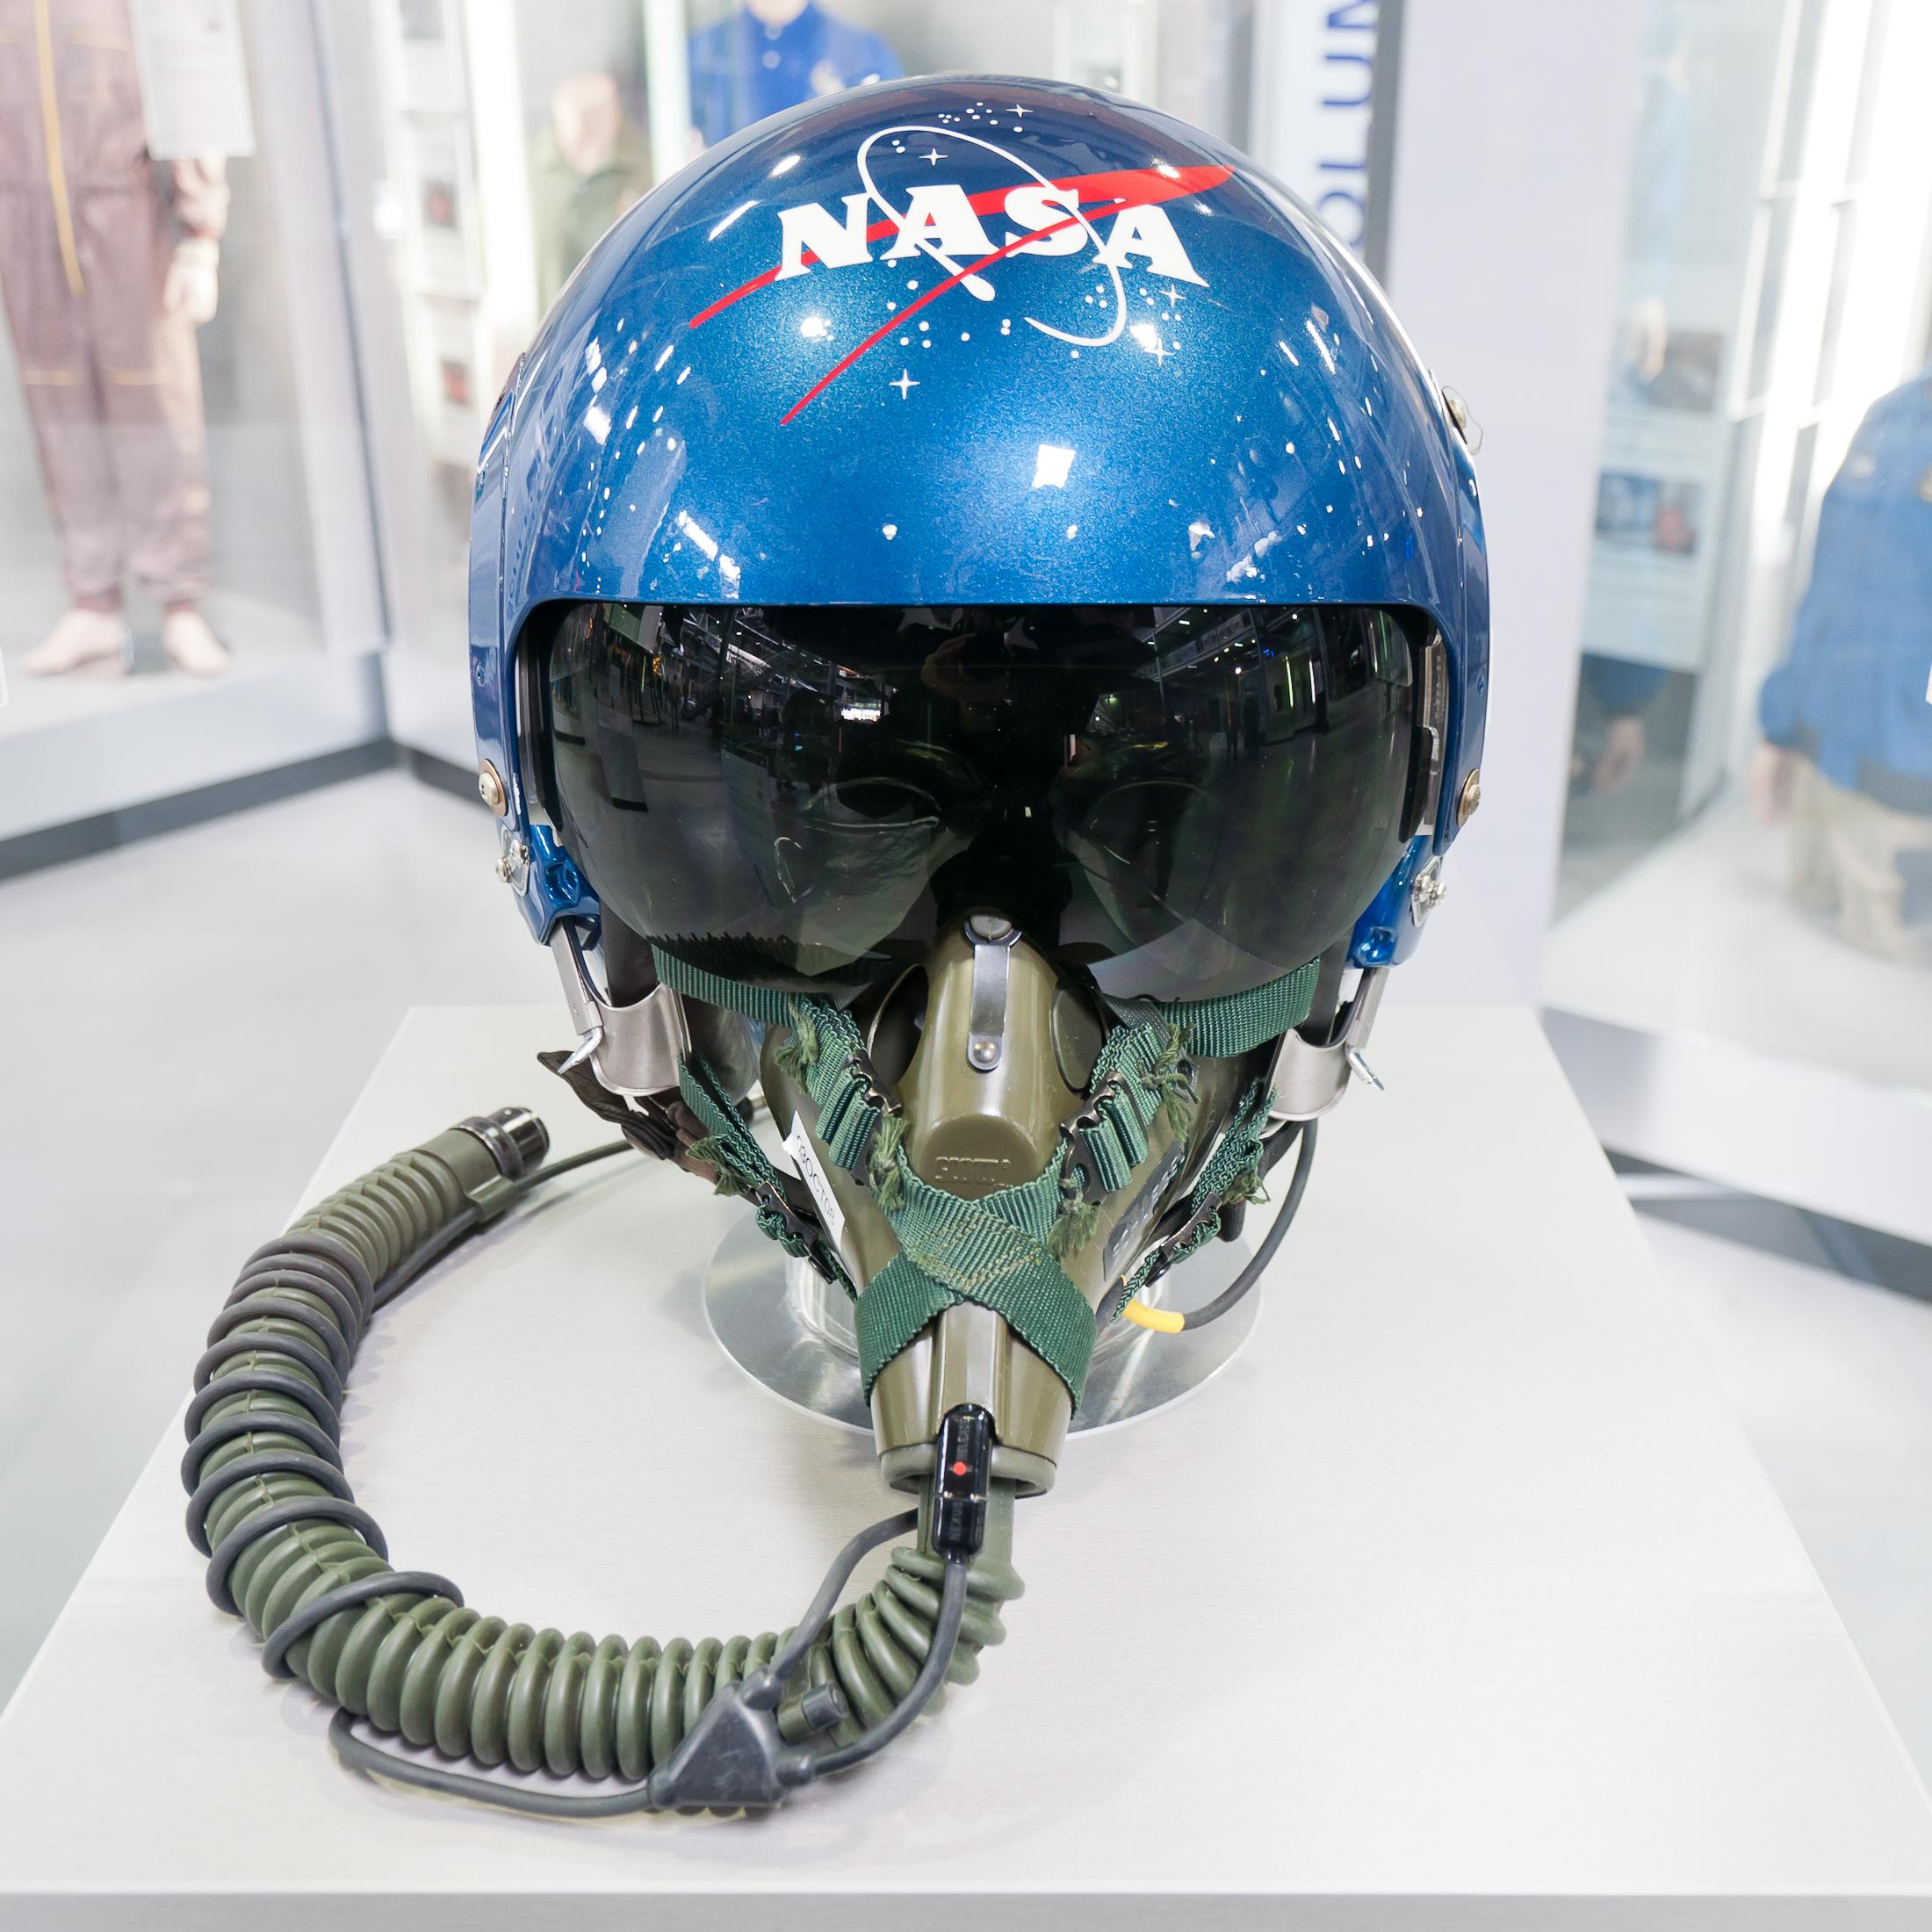 nasa pilot helmet - photo #18